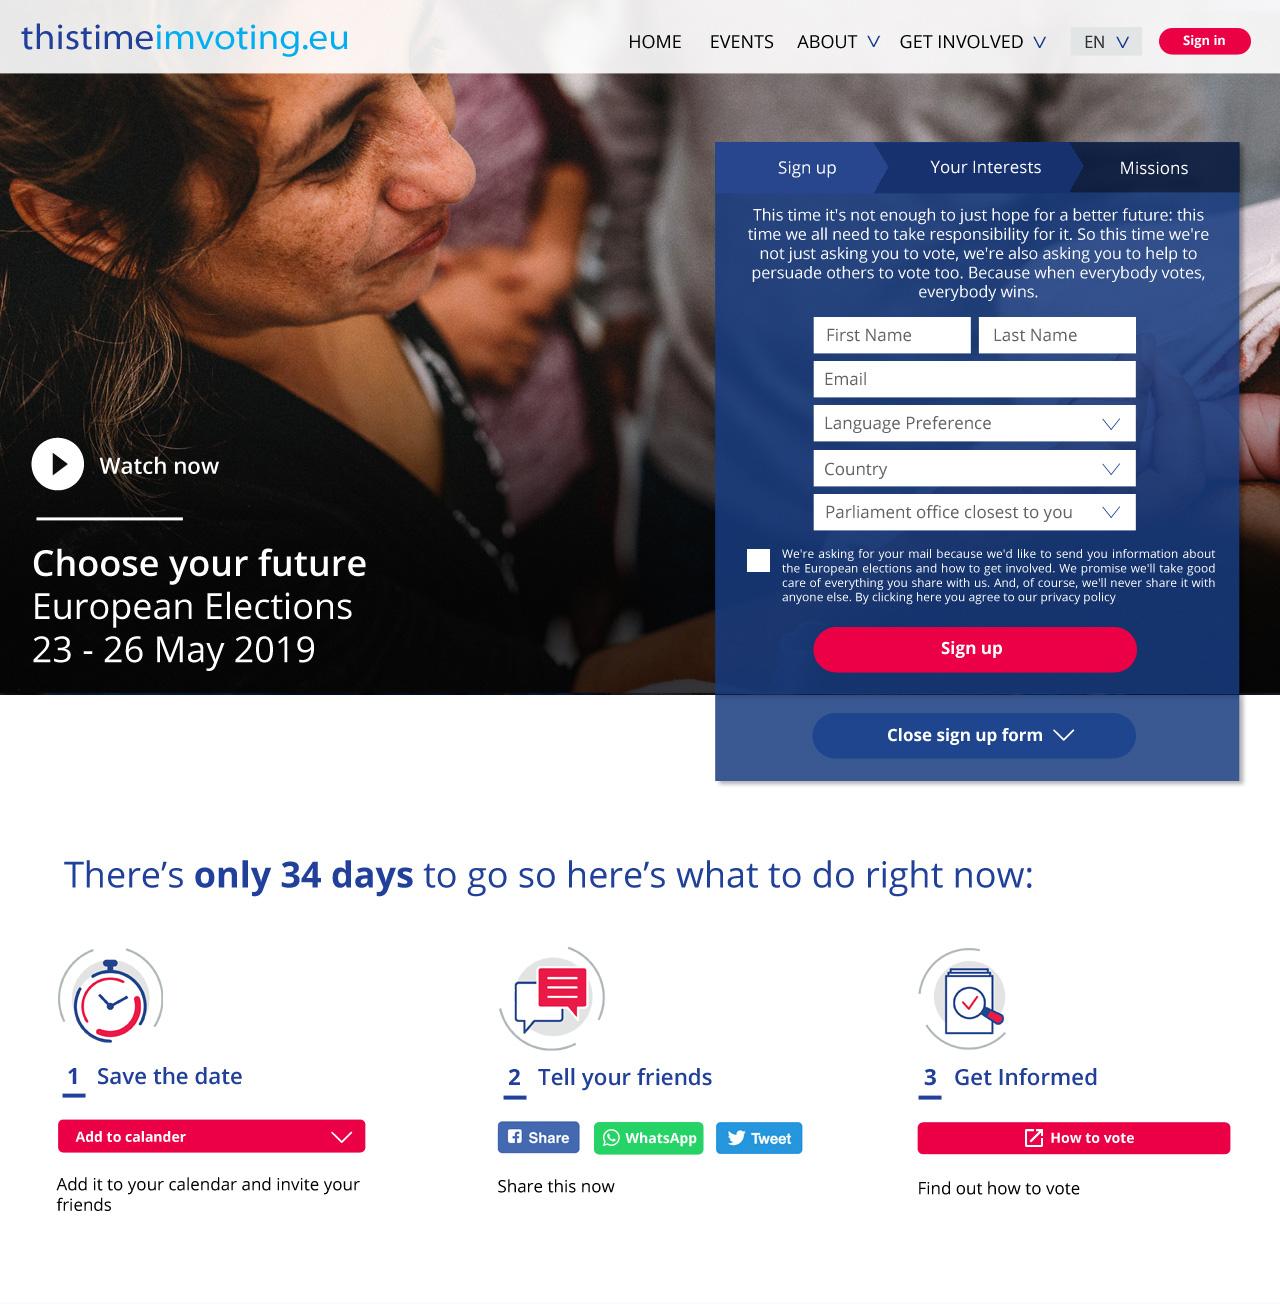 thistimeimvoting.eu Home Page Screenshot